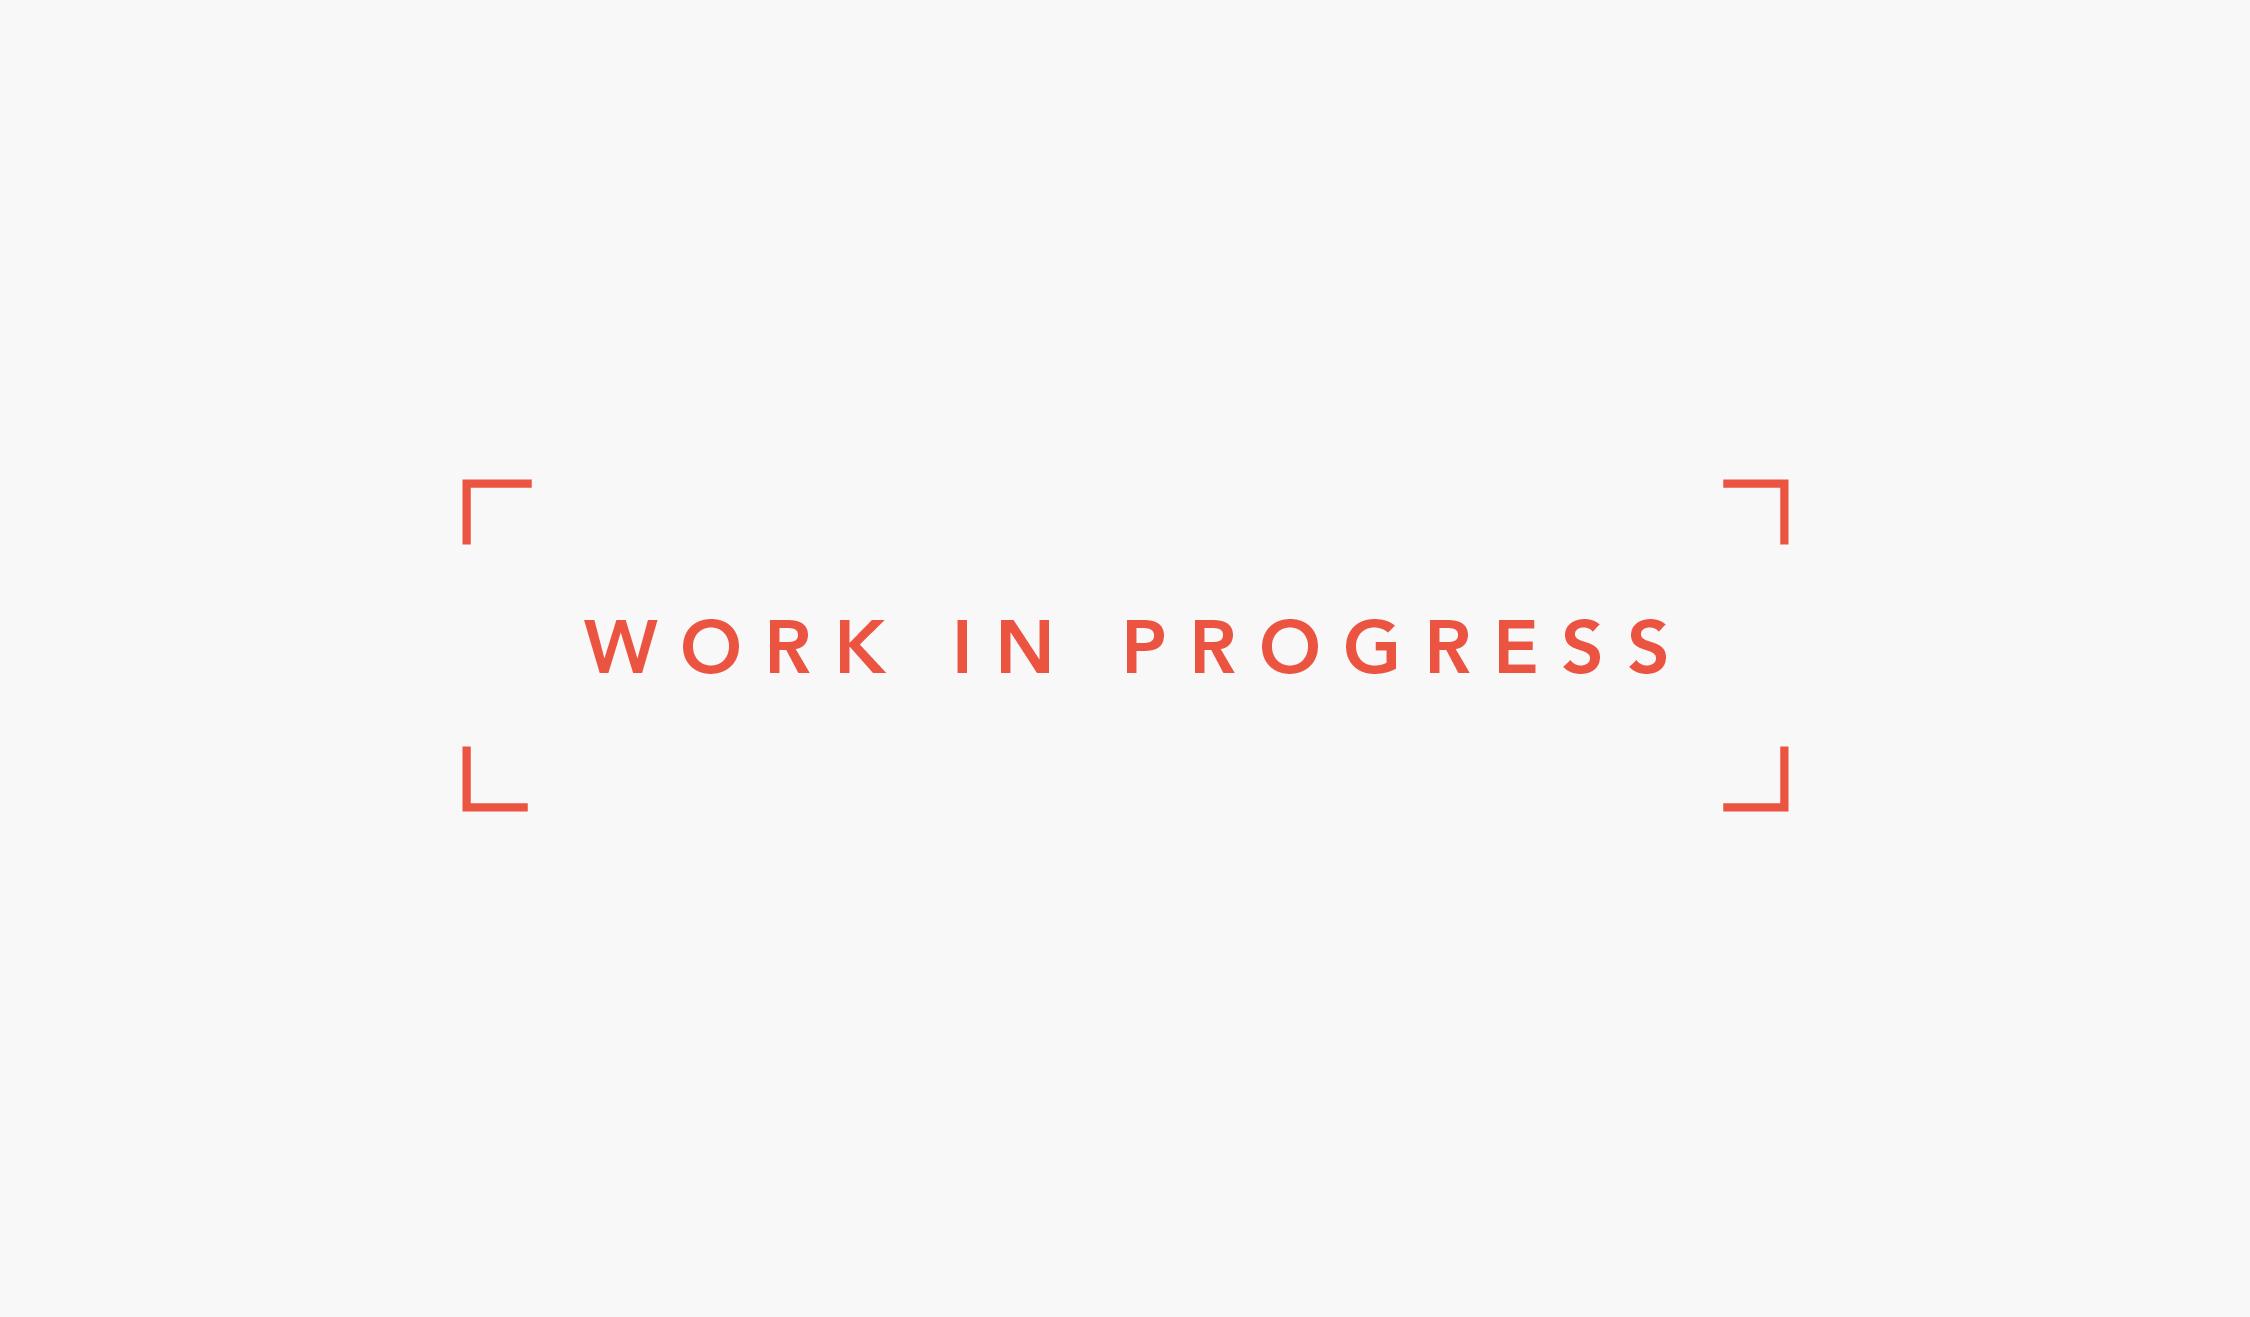 work in progress-11.png